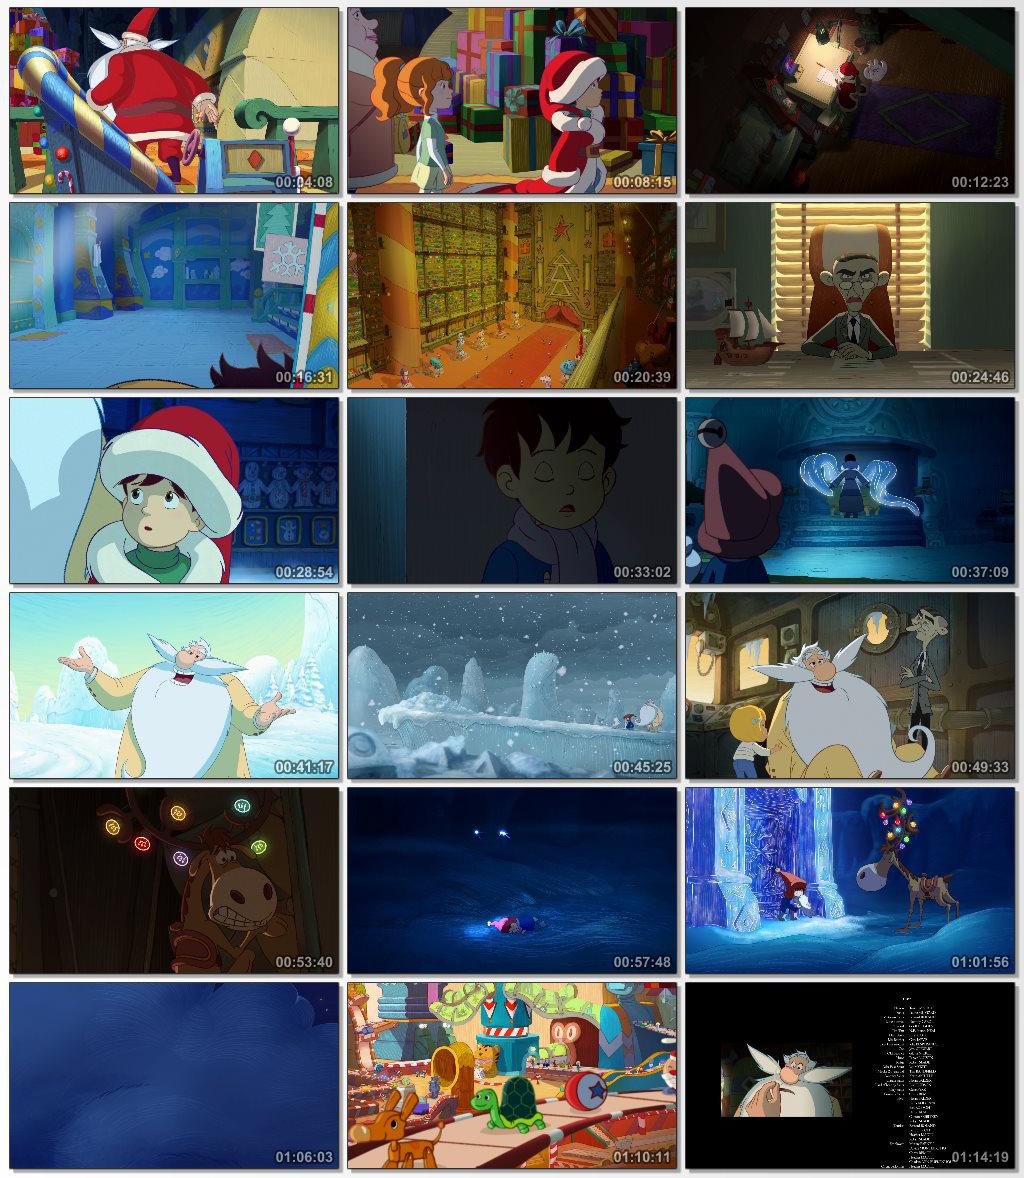 Santas.Apprentice.2010.BluRay.1080p.www.download.ir.mkv_thumbs_[2014.12.16_11.45.35]